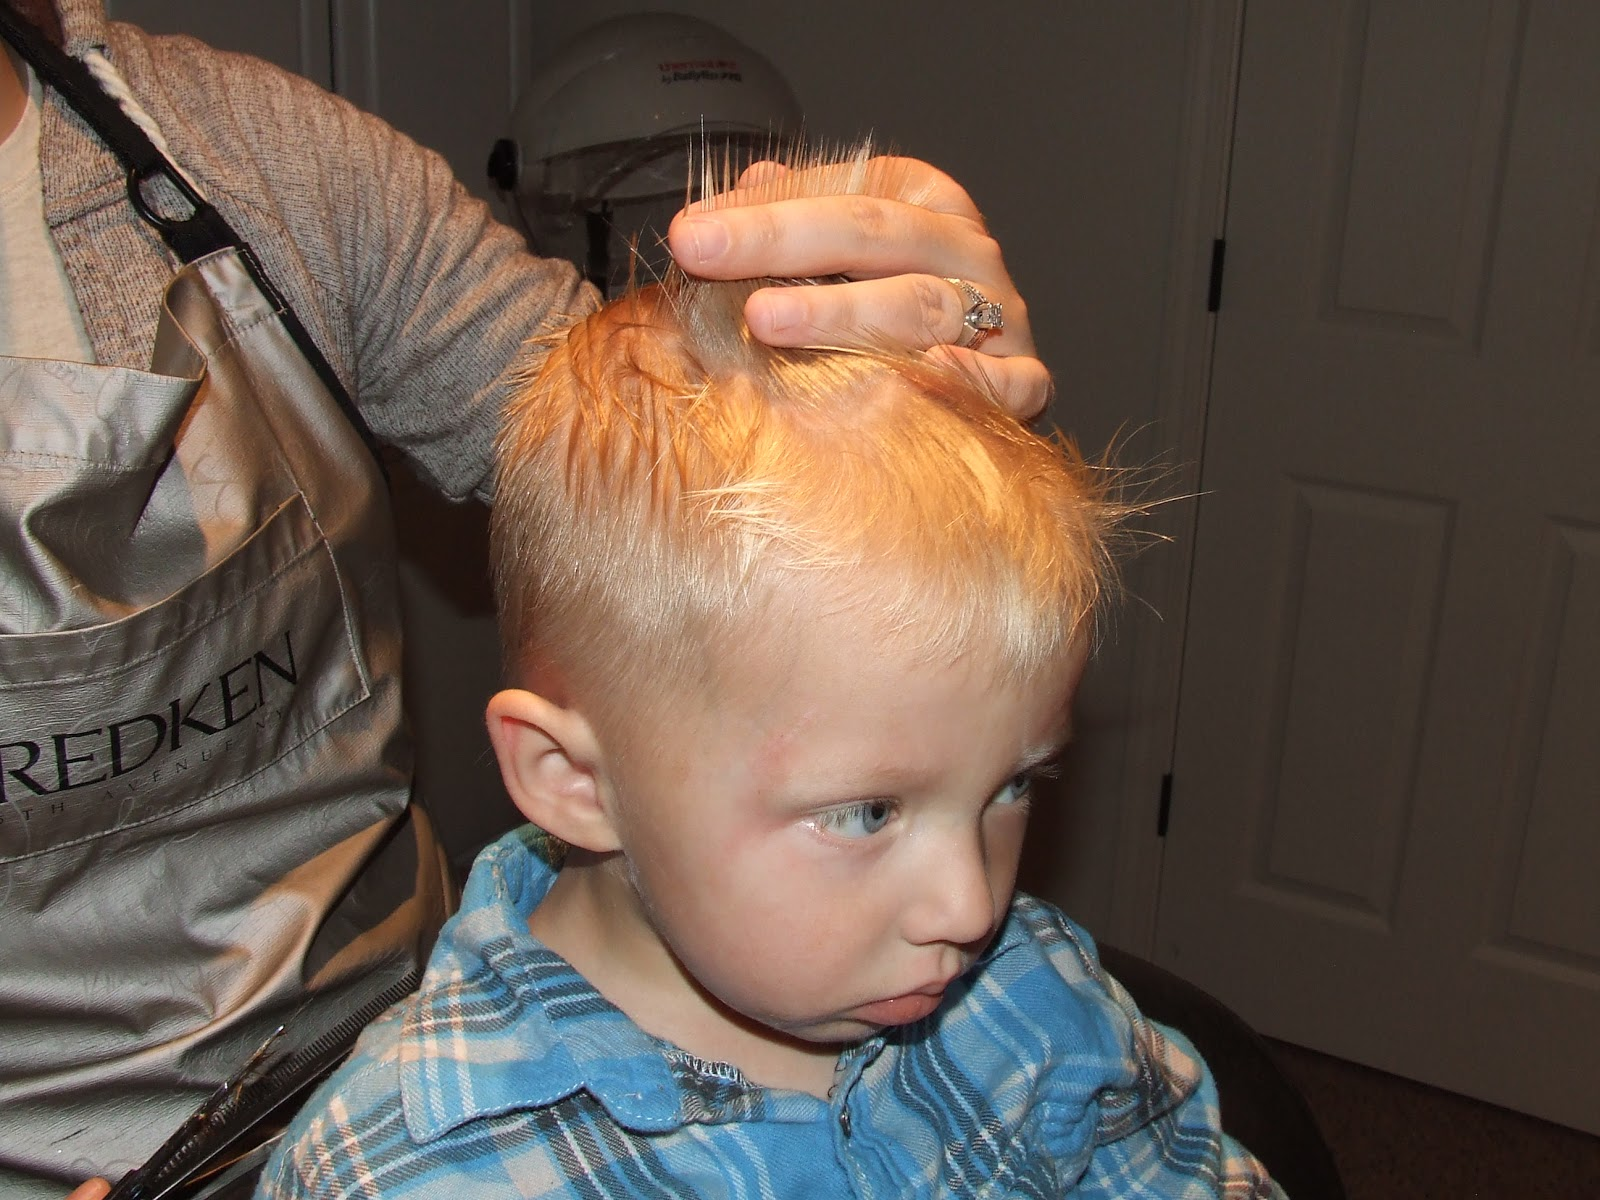 How to Cut Hair Little Boy